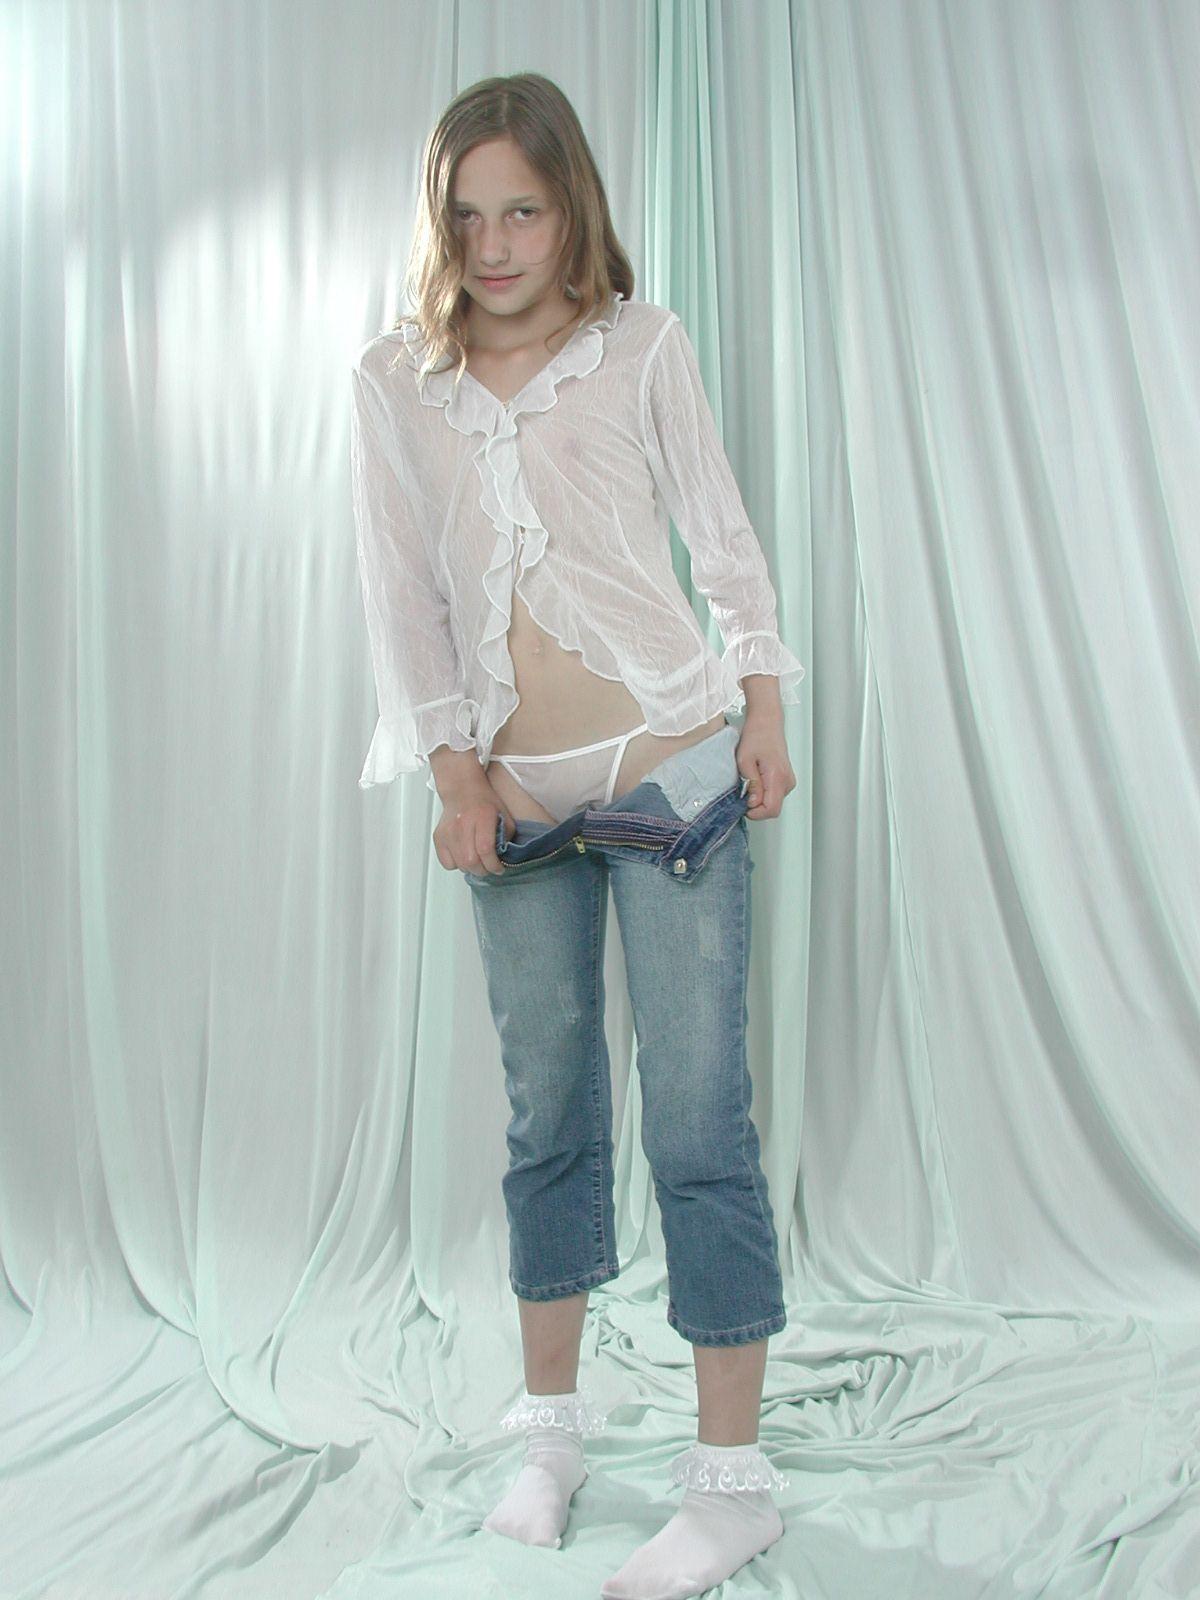 Katya Y111 Topless